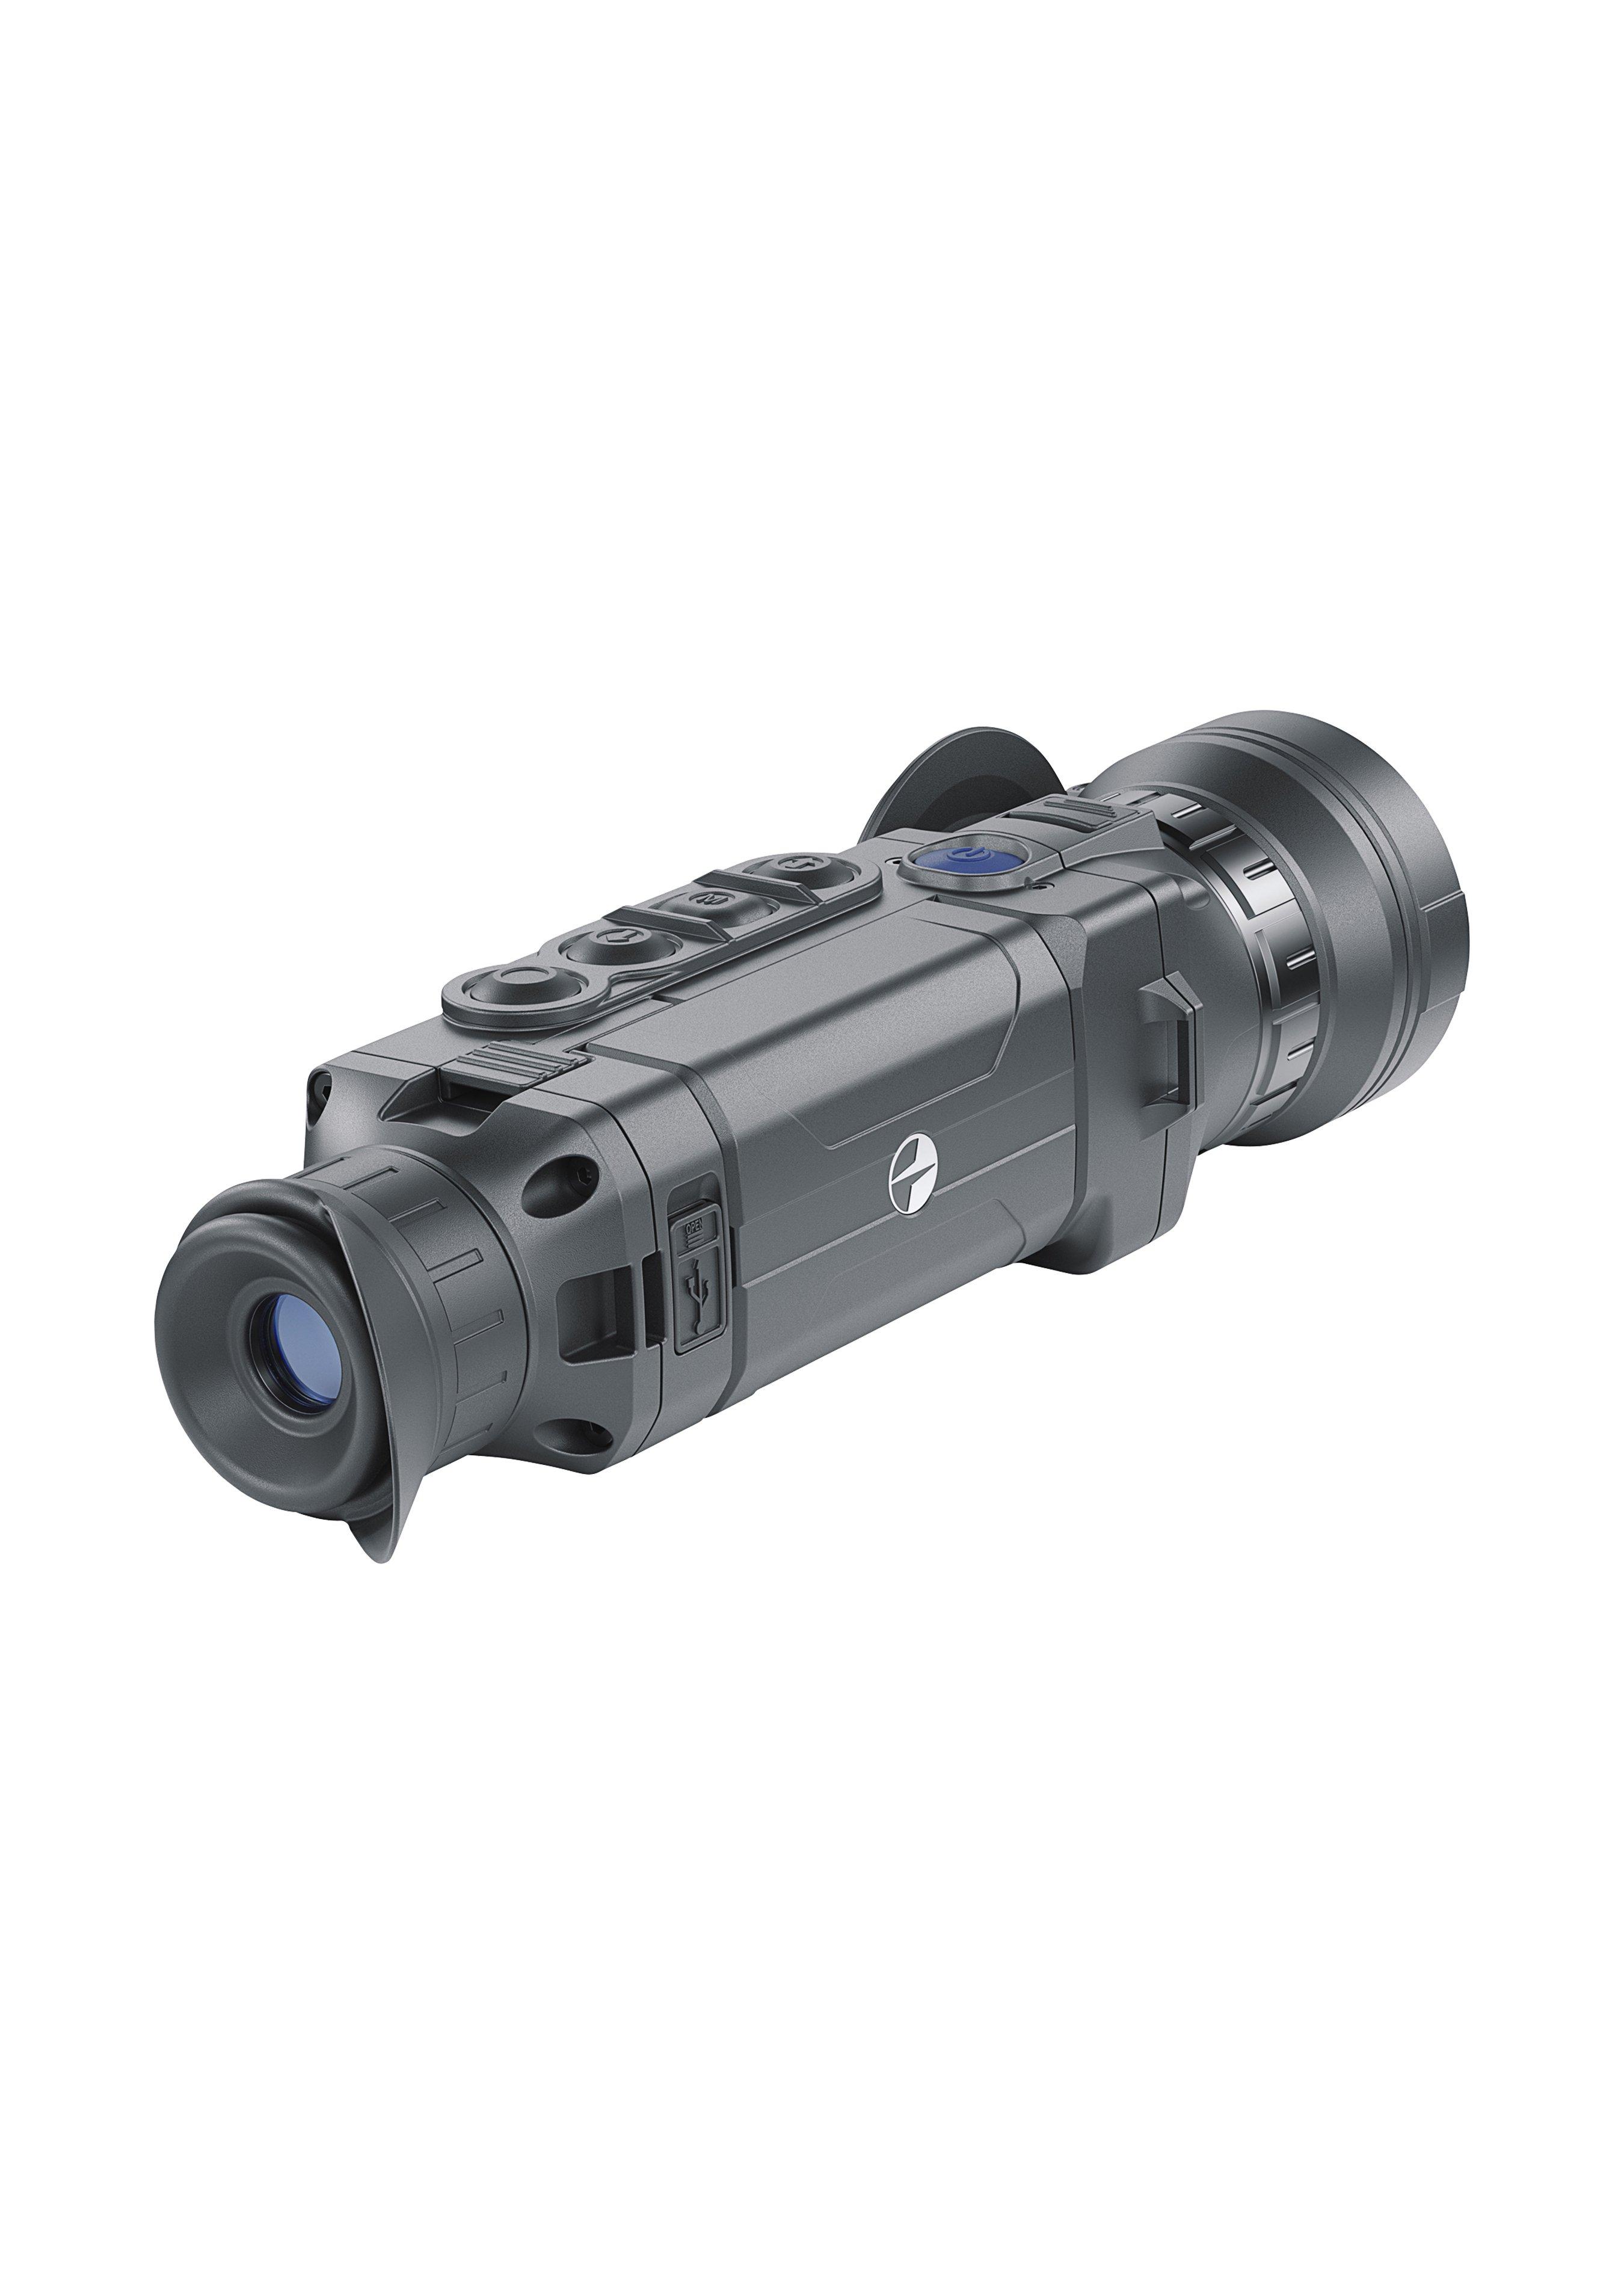 Pulsar Wärmebildkamera Helion-2 XQ50F 199810 2